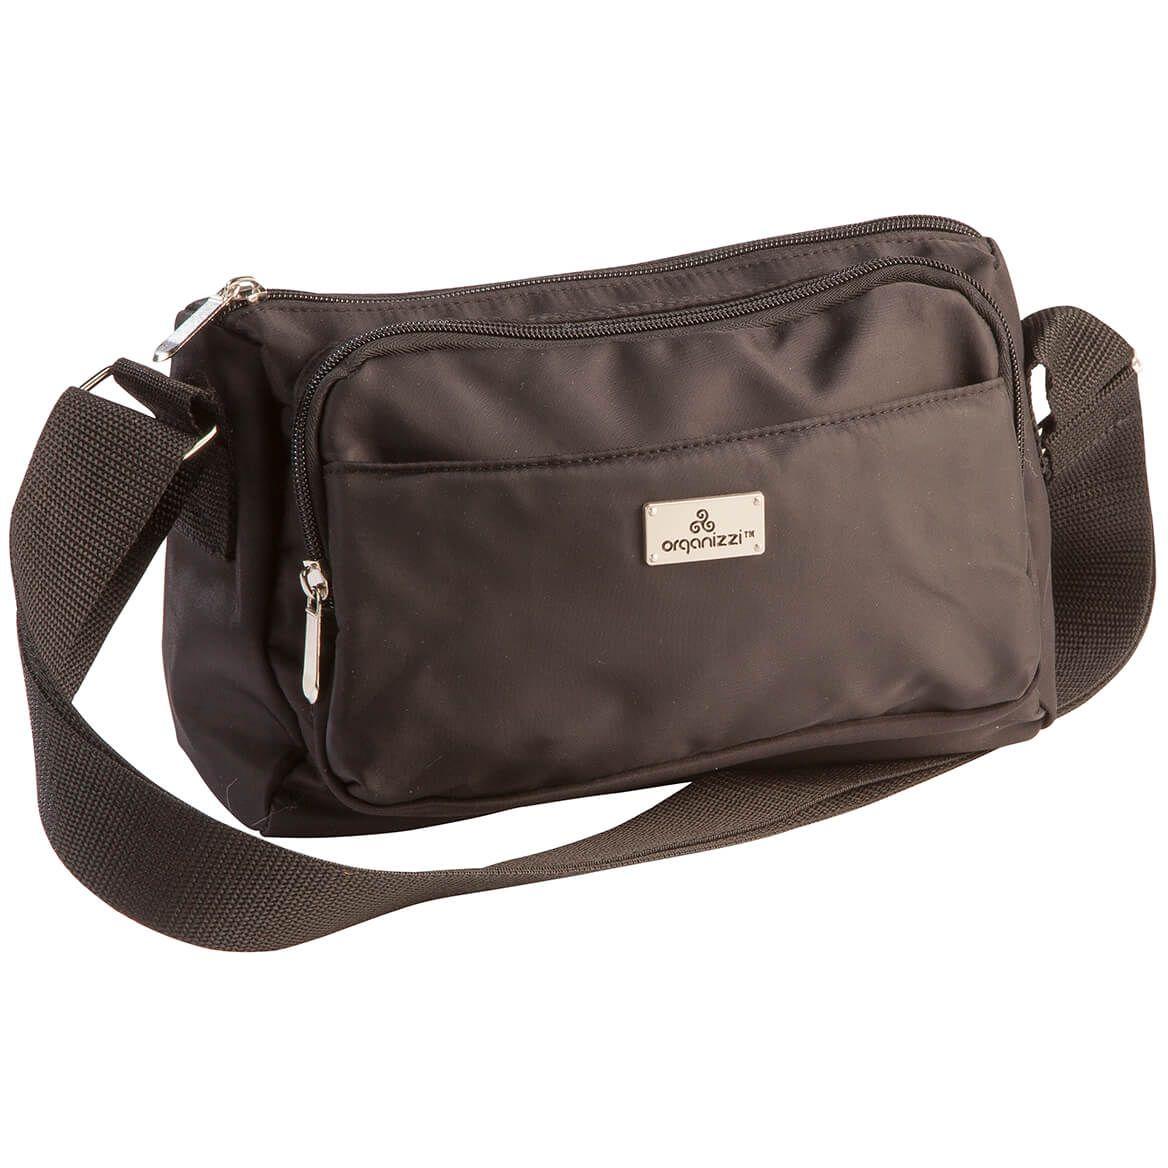 OrganiZZi™ RFID Activewear Crossbody Bag-367667